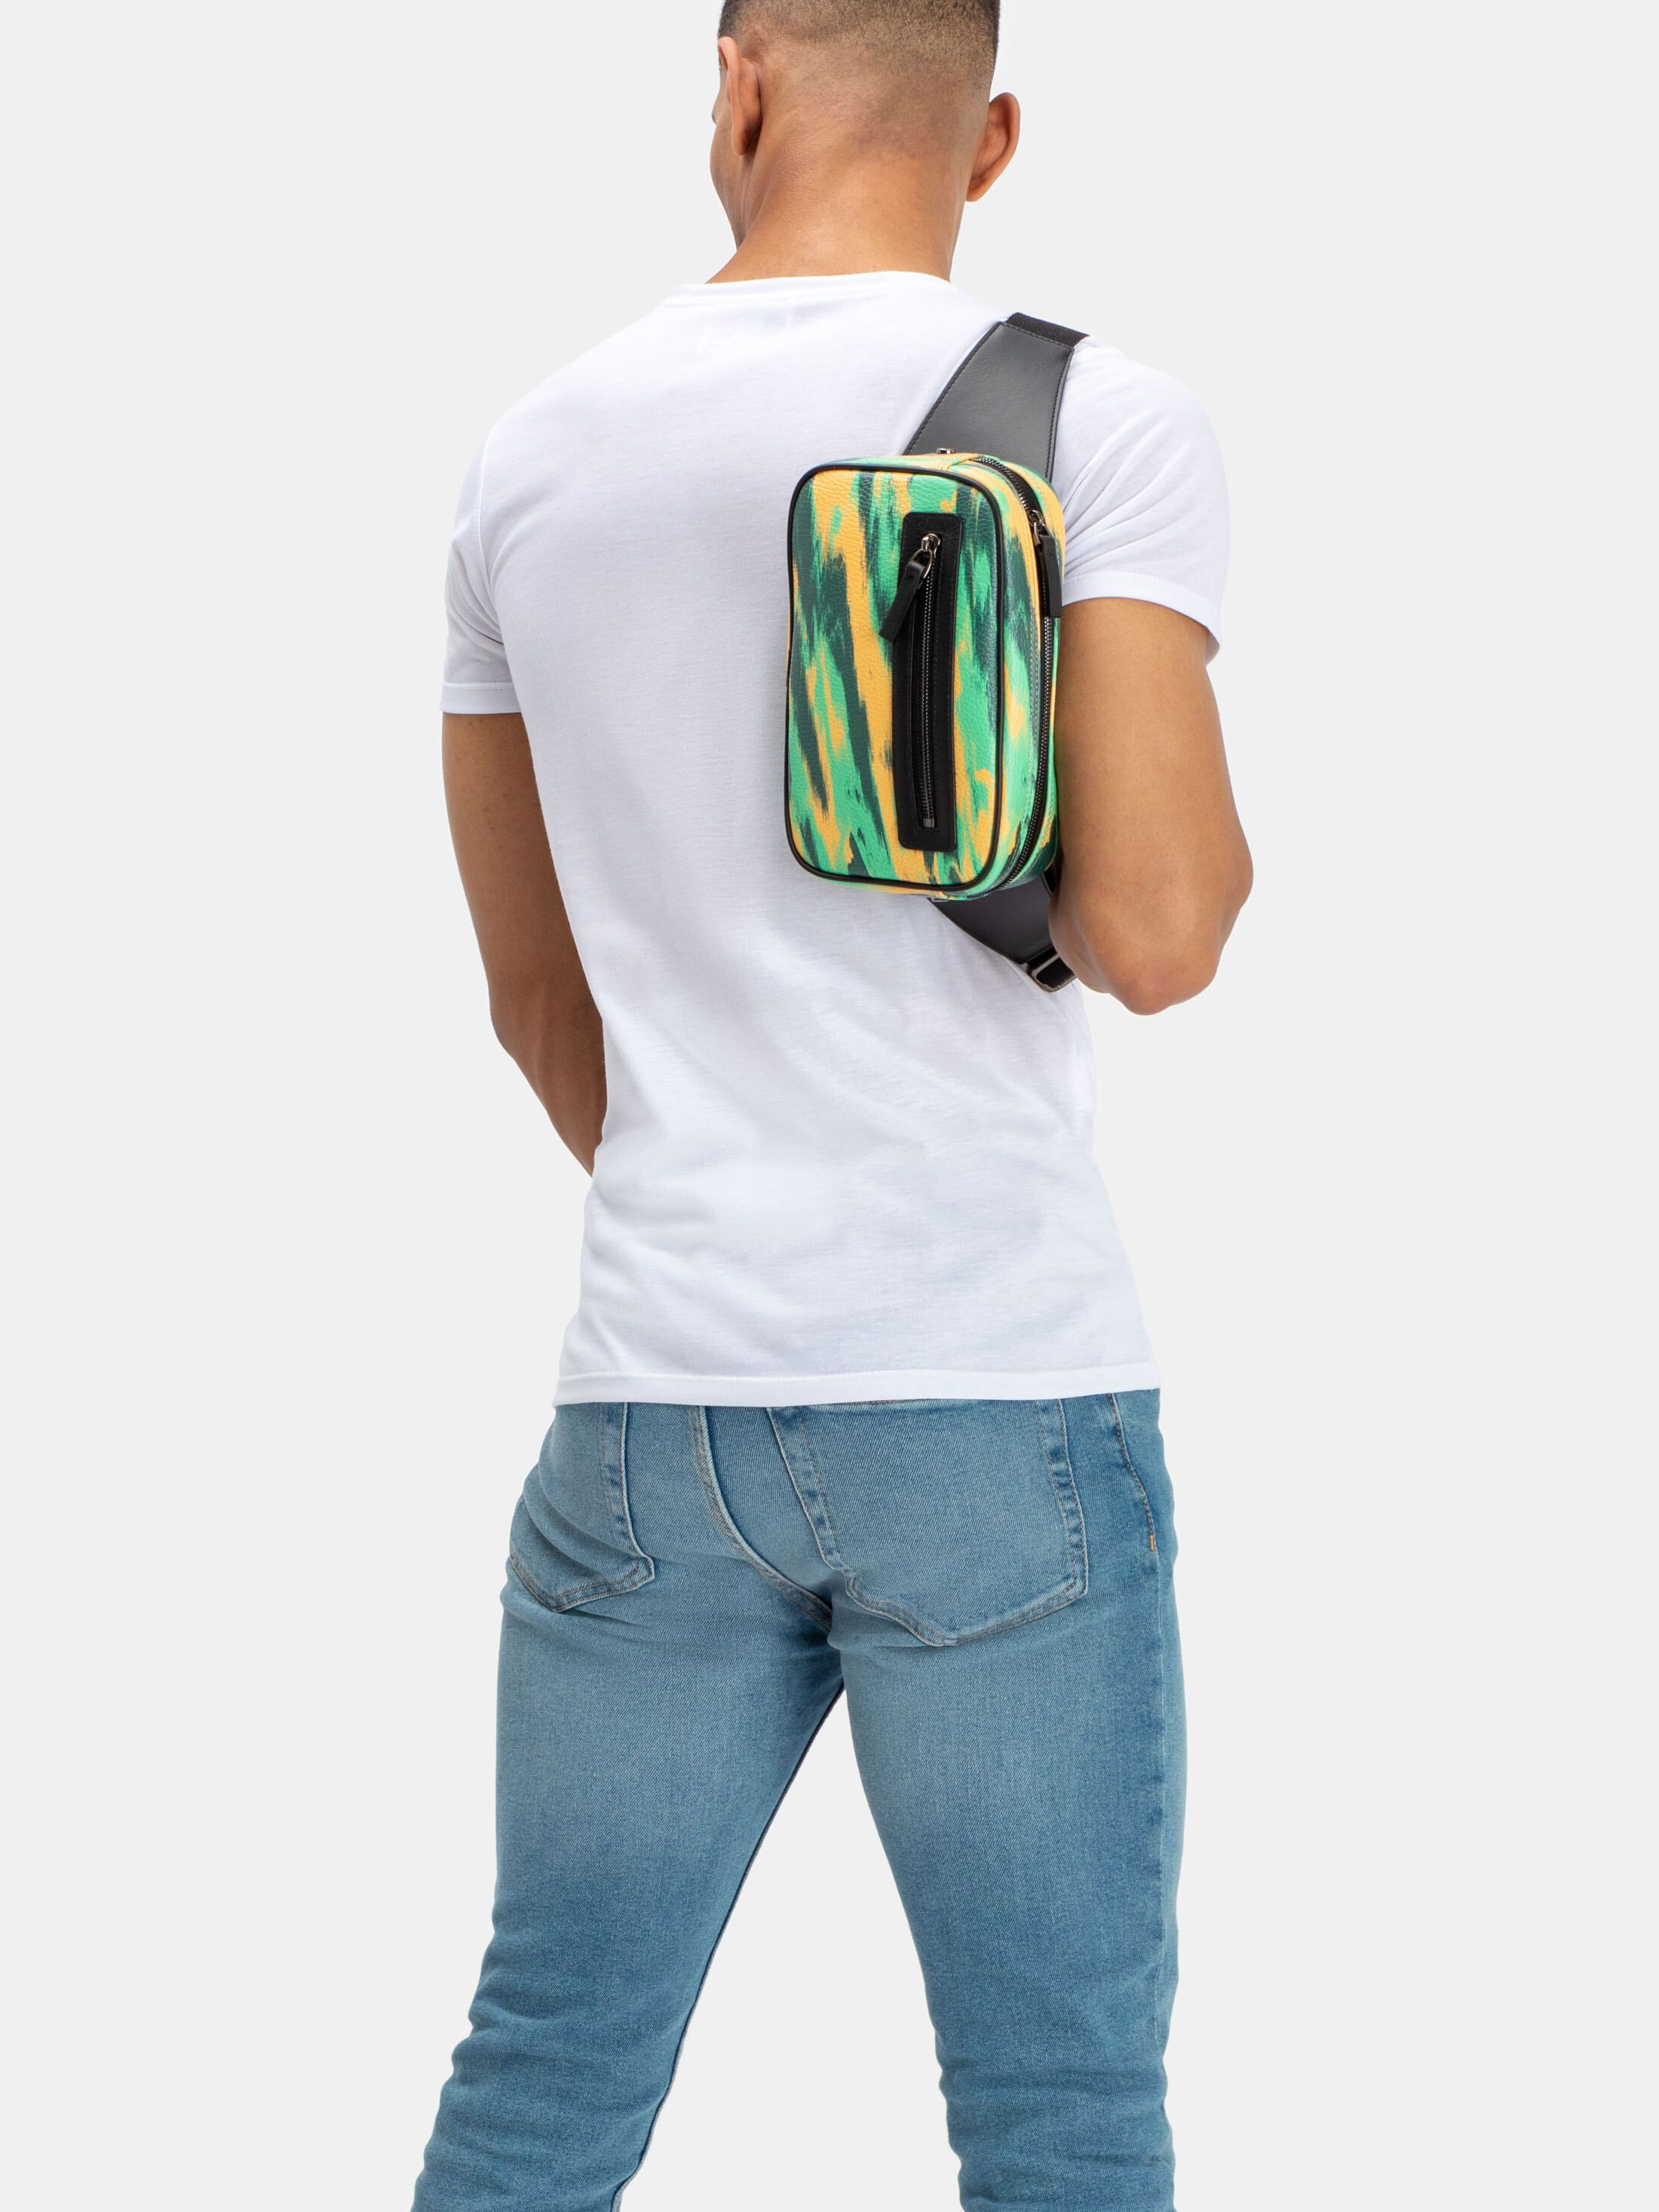 printed bum bag with zip